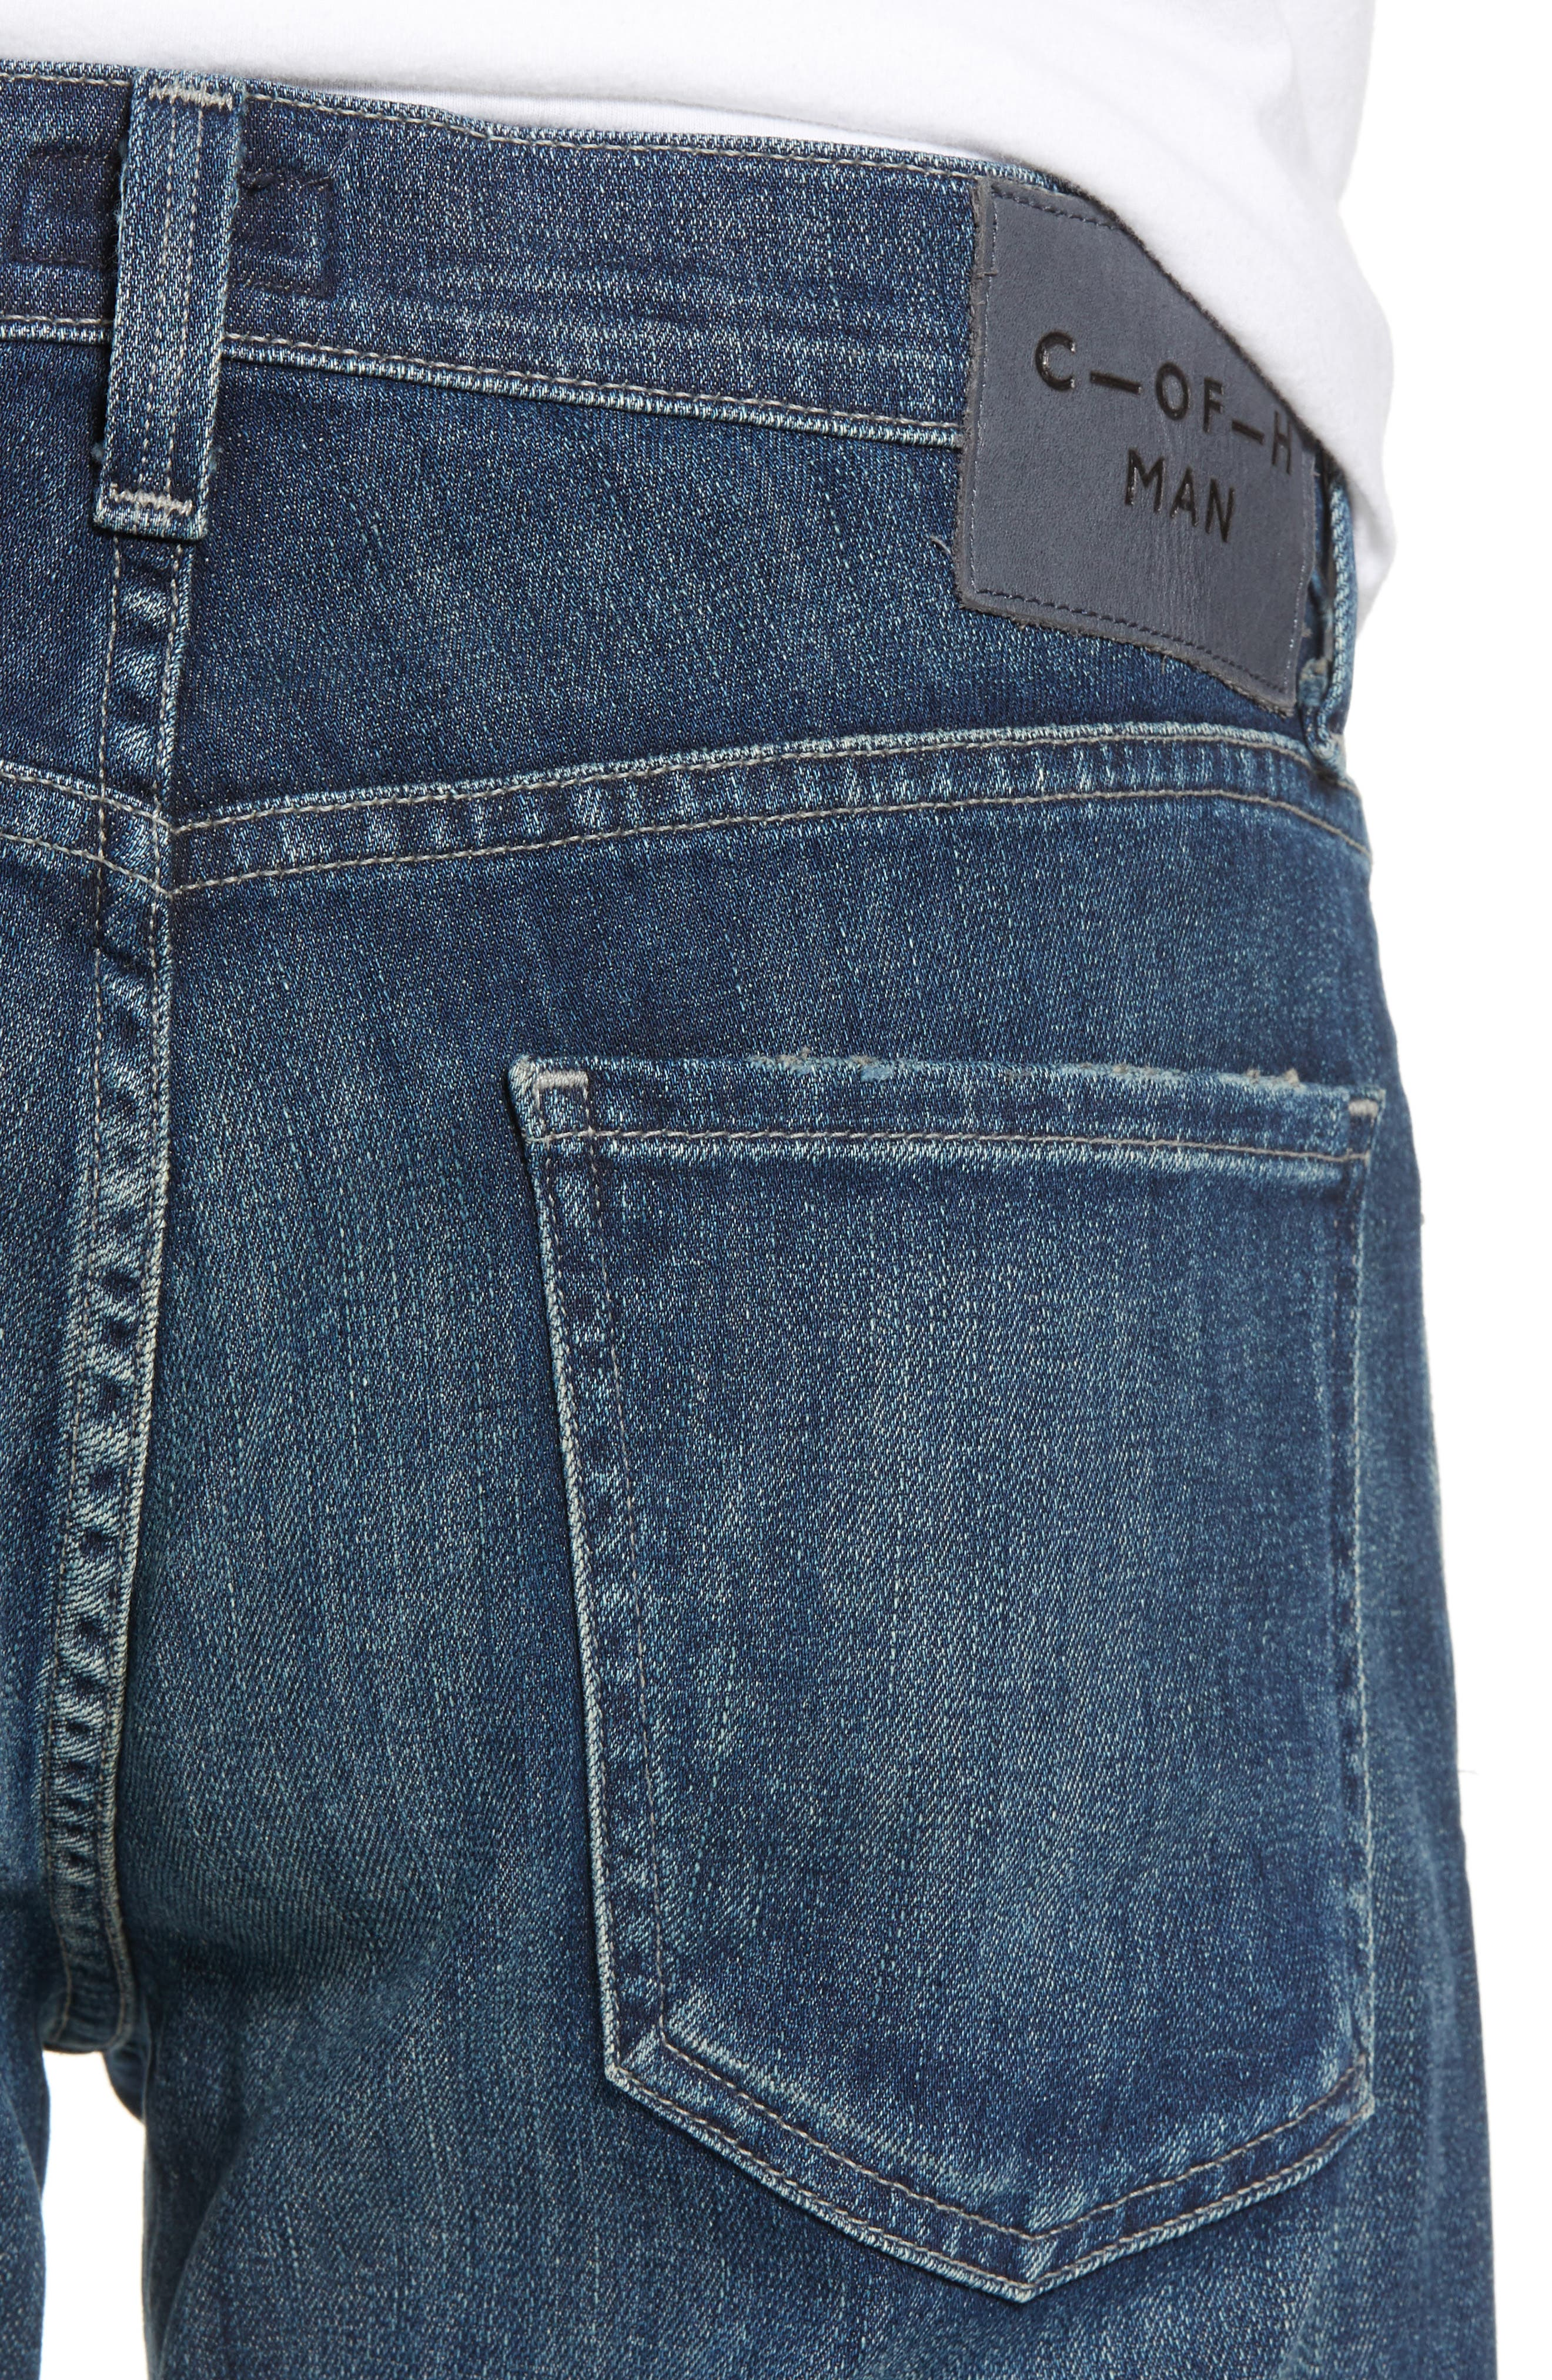 Core Slim Fit Jeans,                             Alternate thumbnail 4, color,                             ARENA